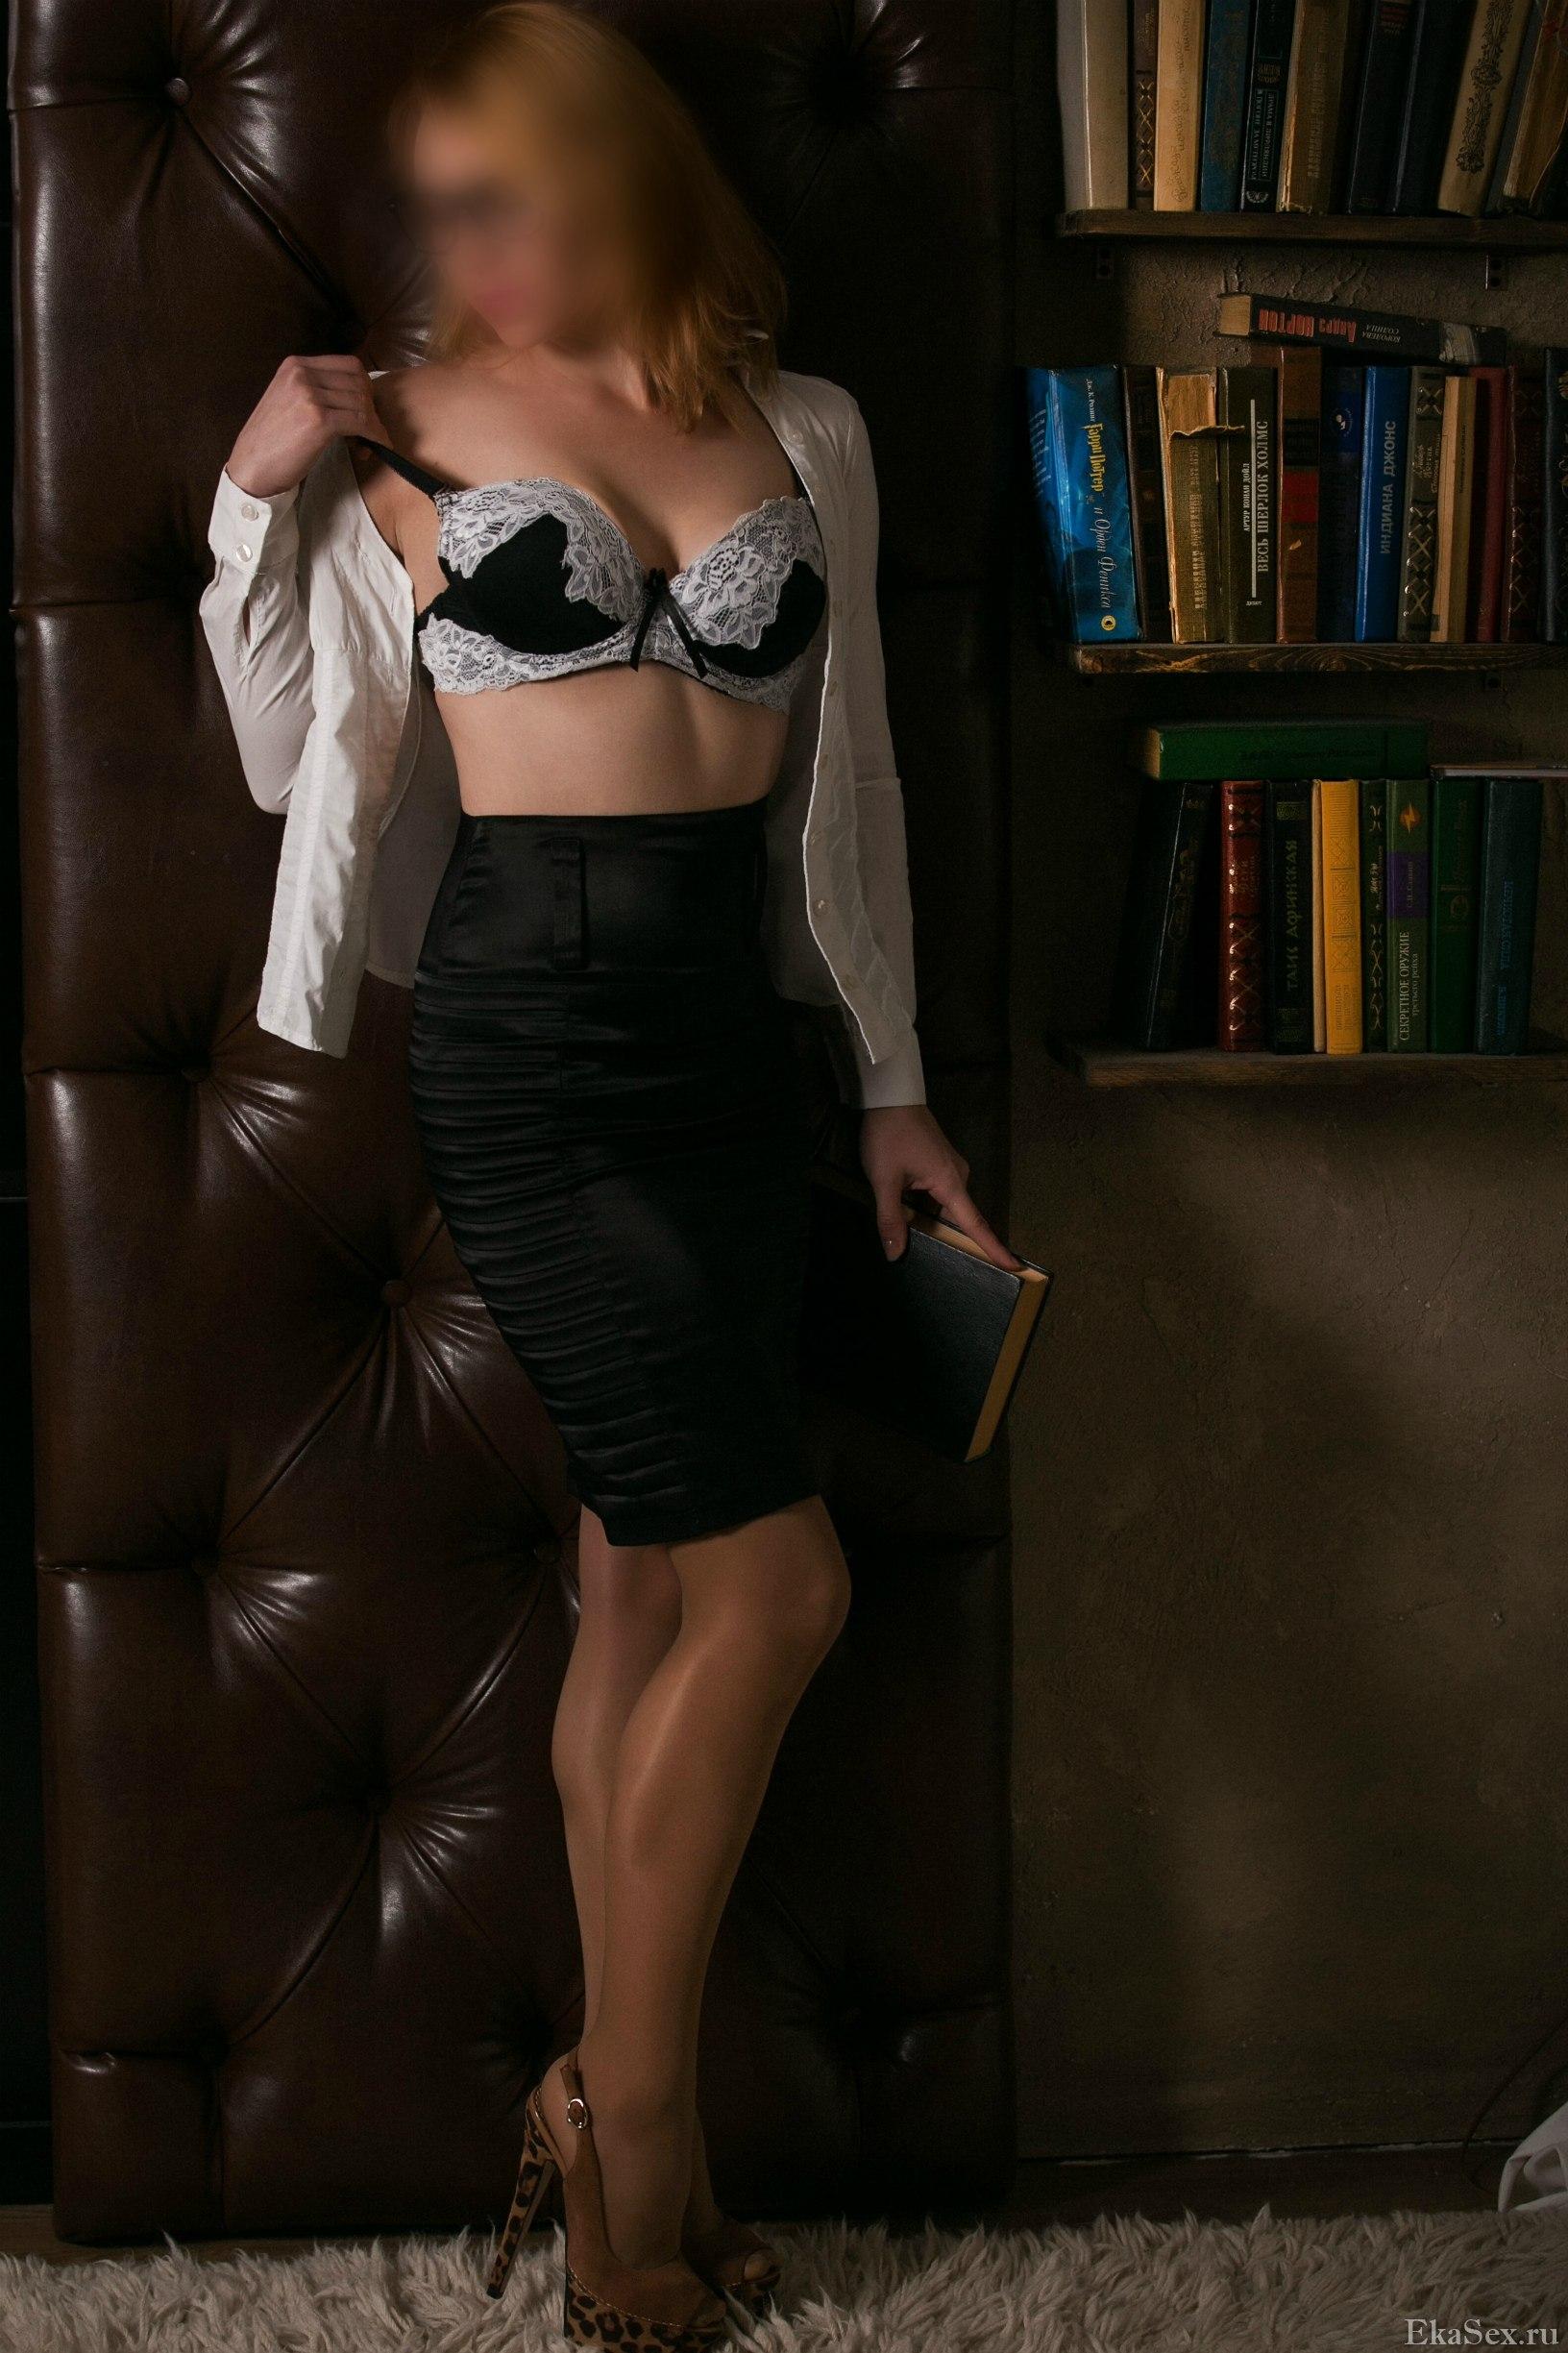 фото проститутки Аленушка из города Екатеринбург